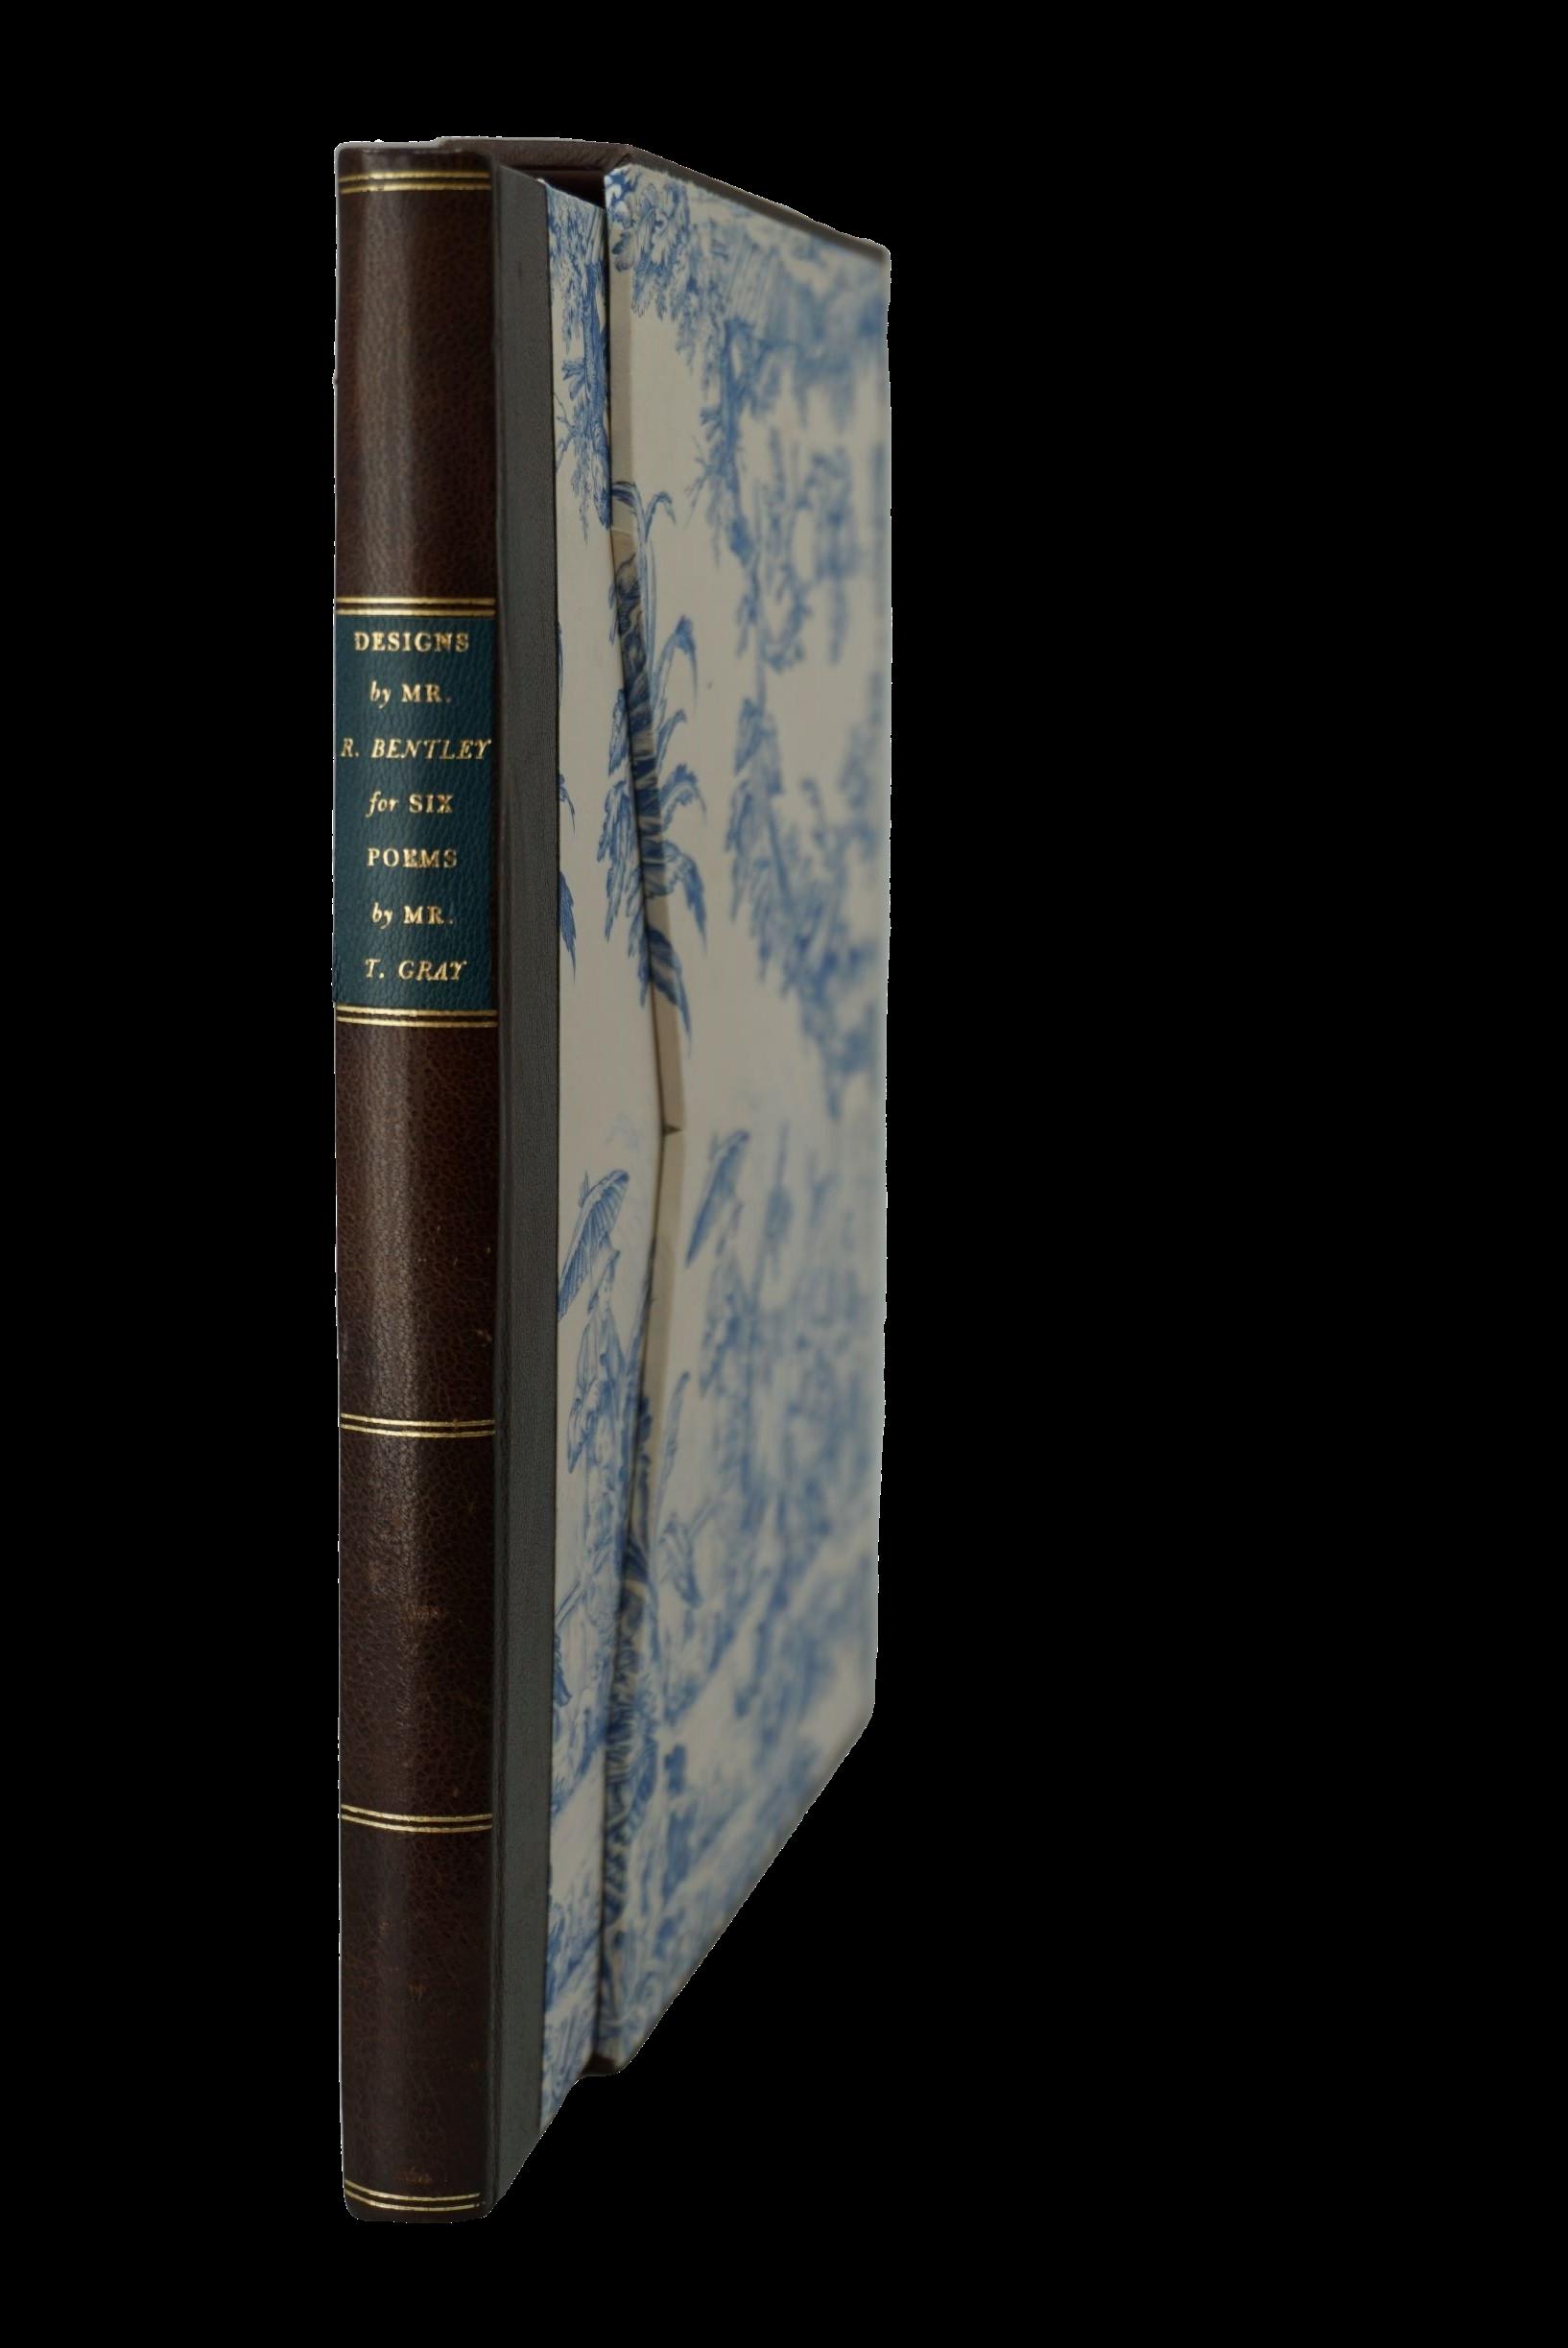 Six Poems byMr. T. Gray